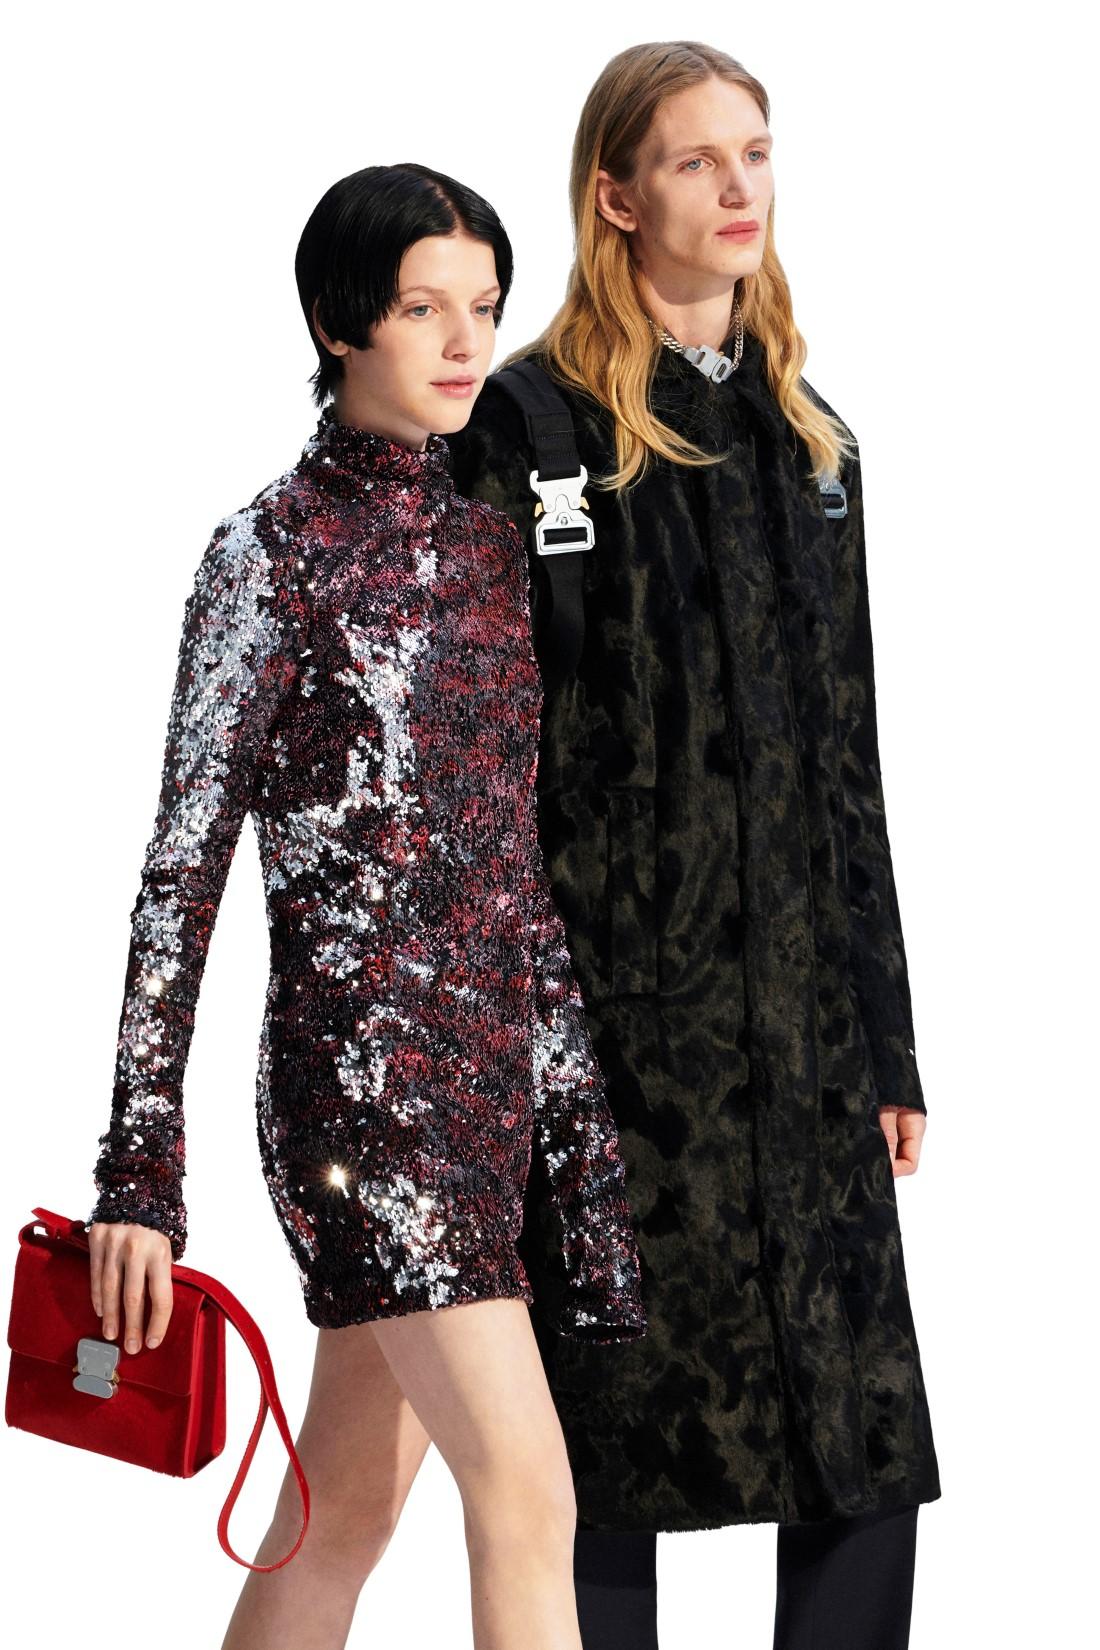 1017 Alyx 9SM - Automne-Hiver 2021 - Paris Fashion Week